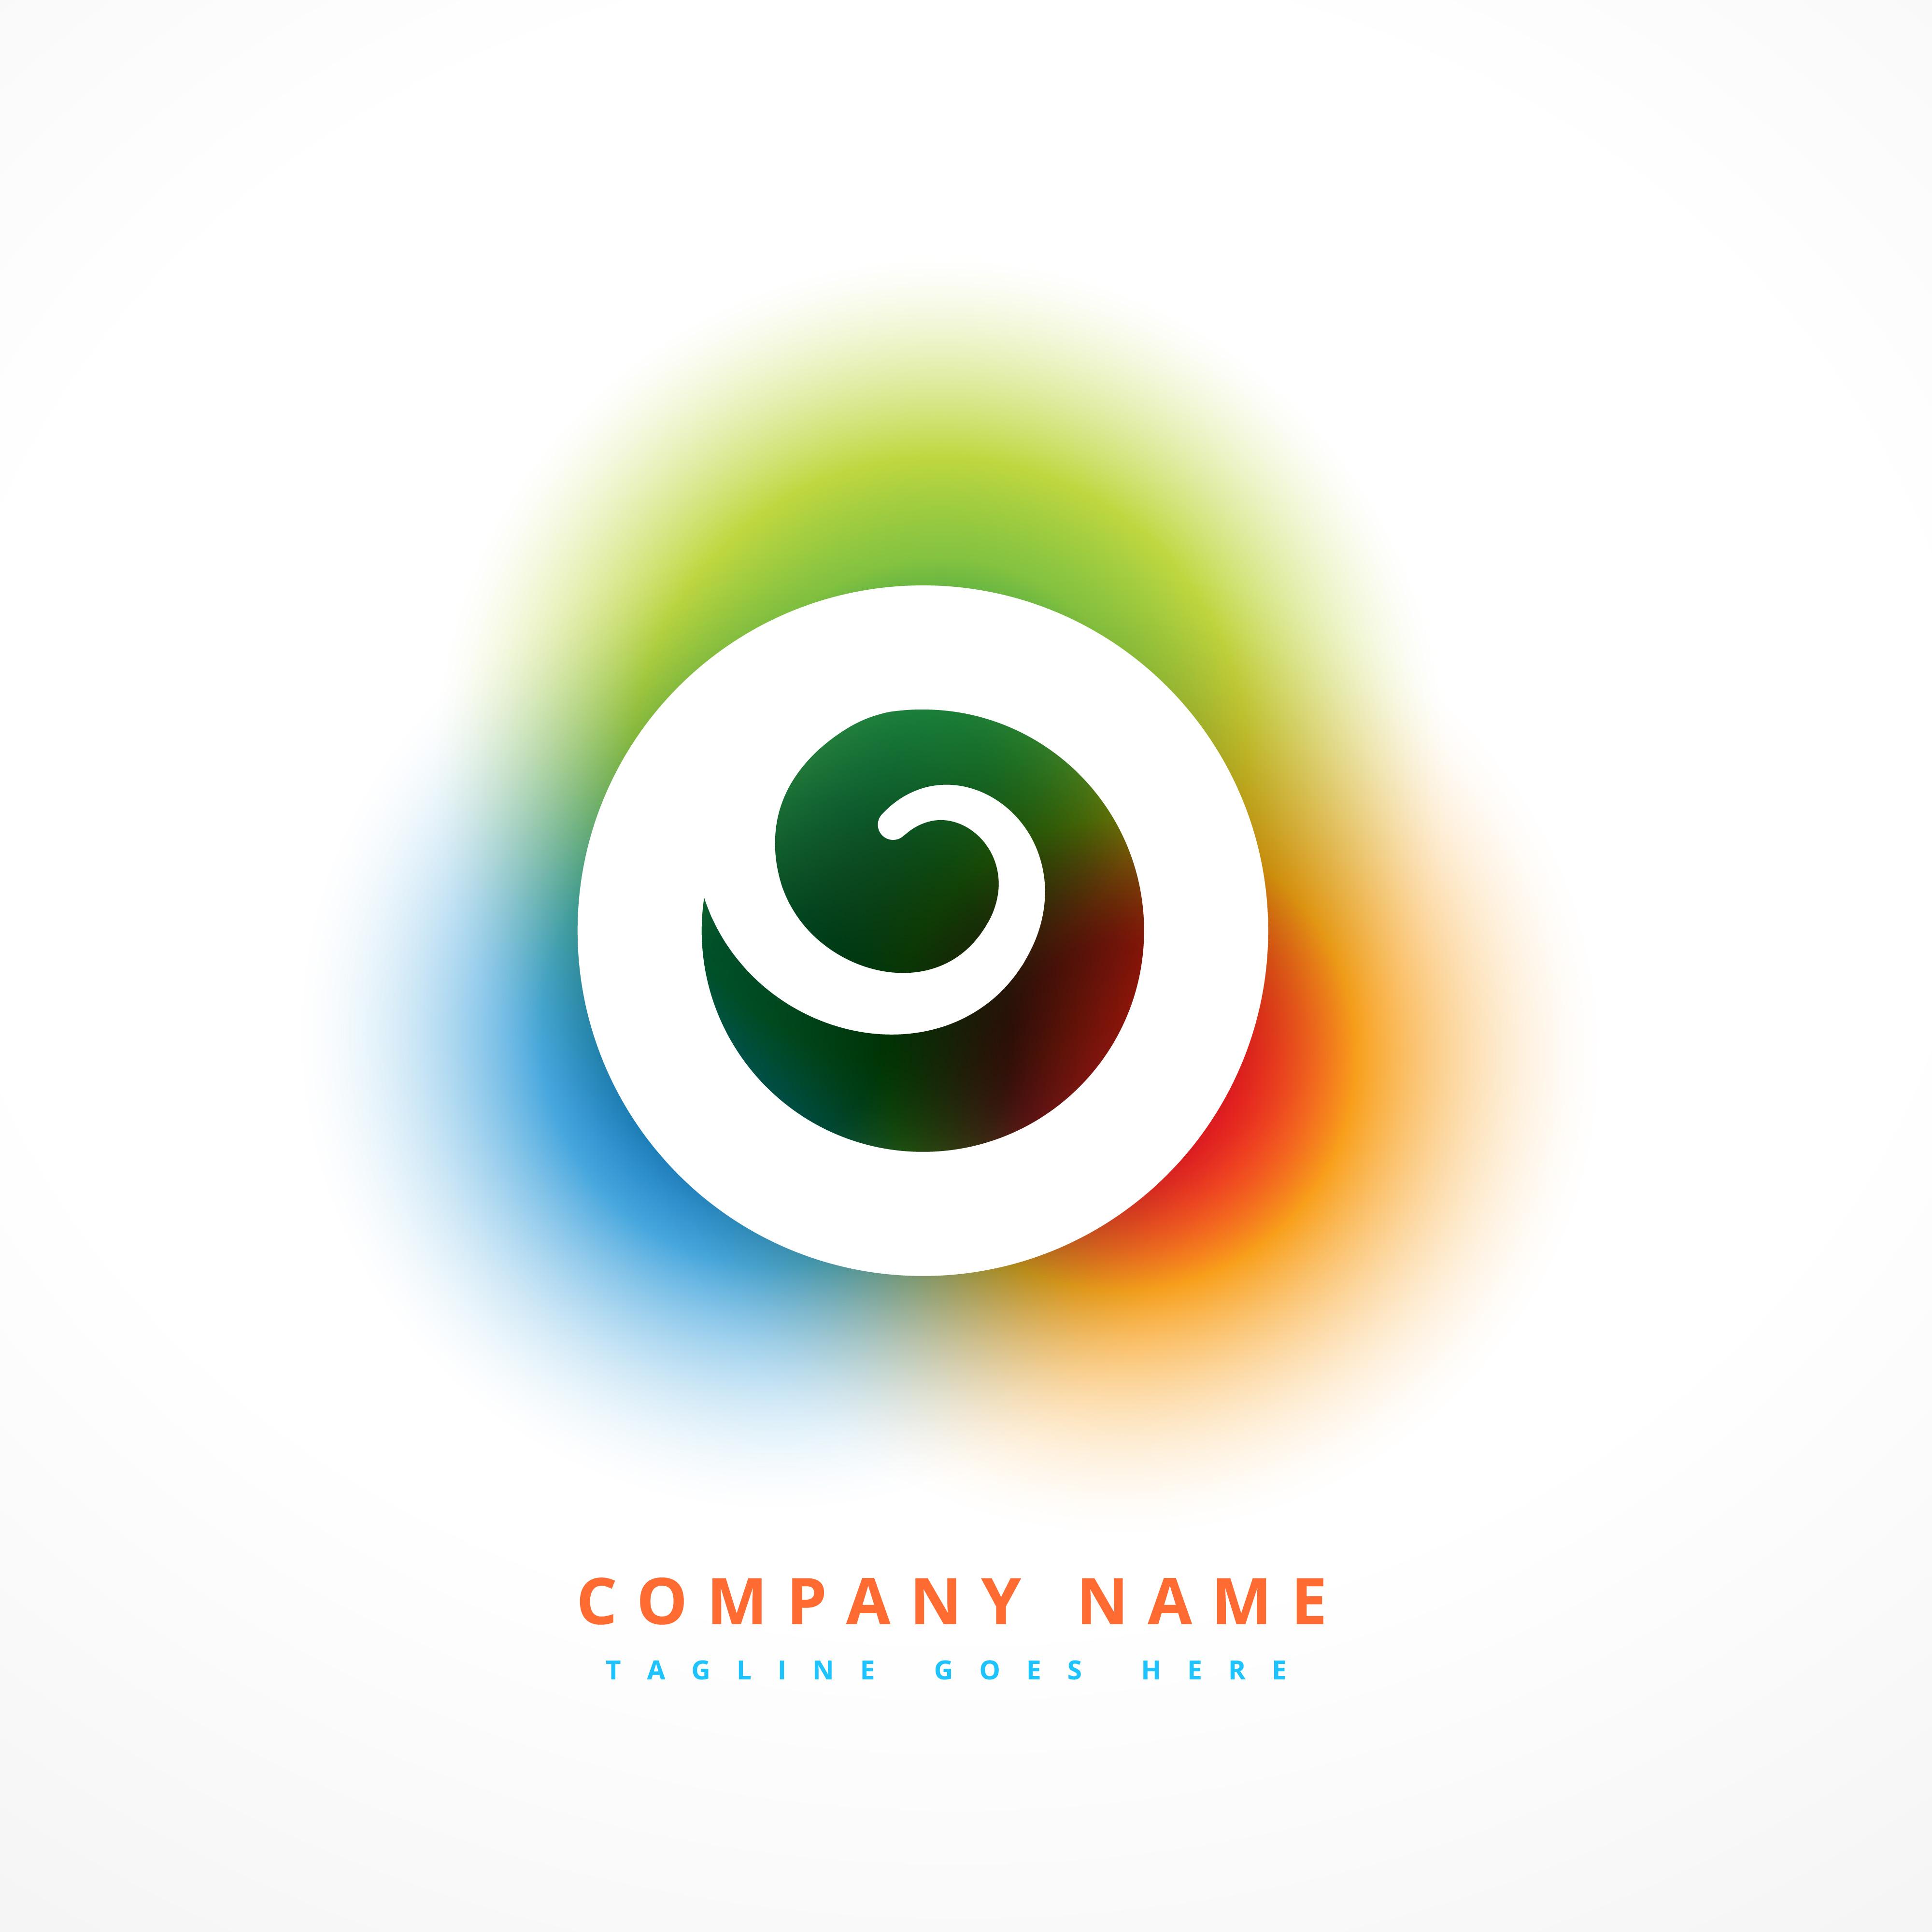 16 3D Logo Templates Images - Free 3D Logo Design